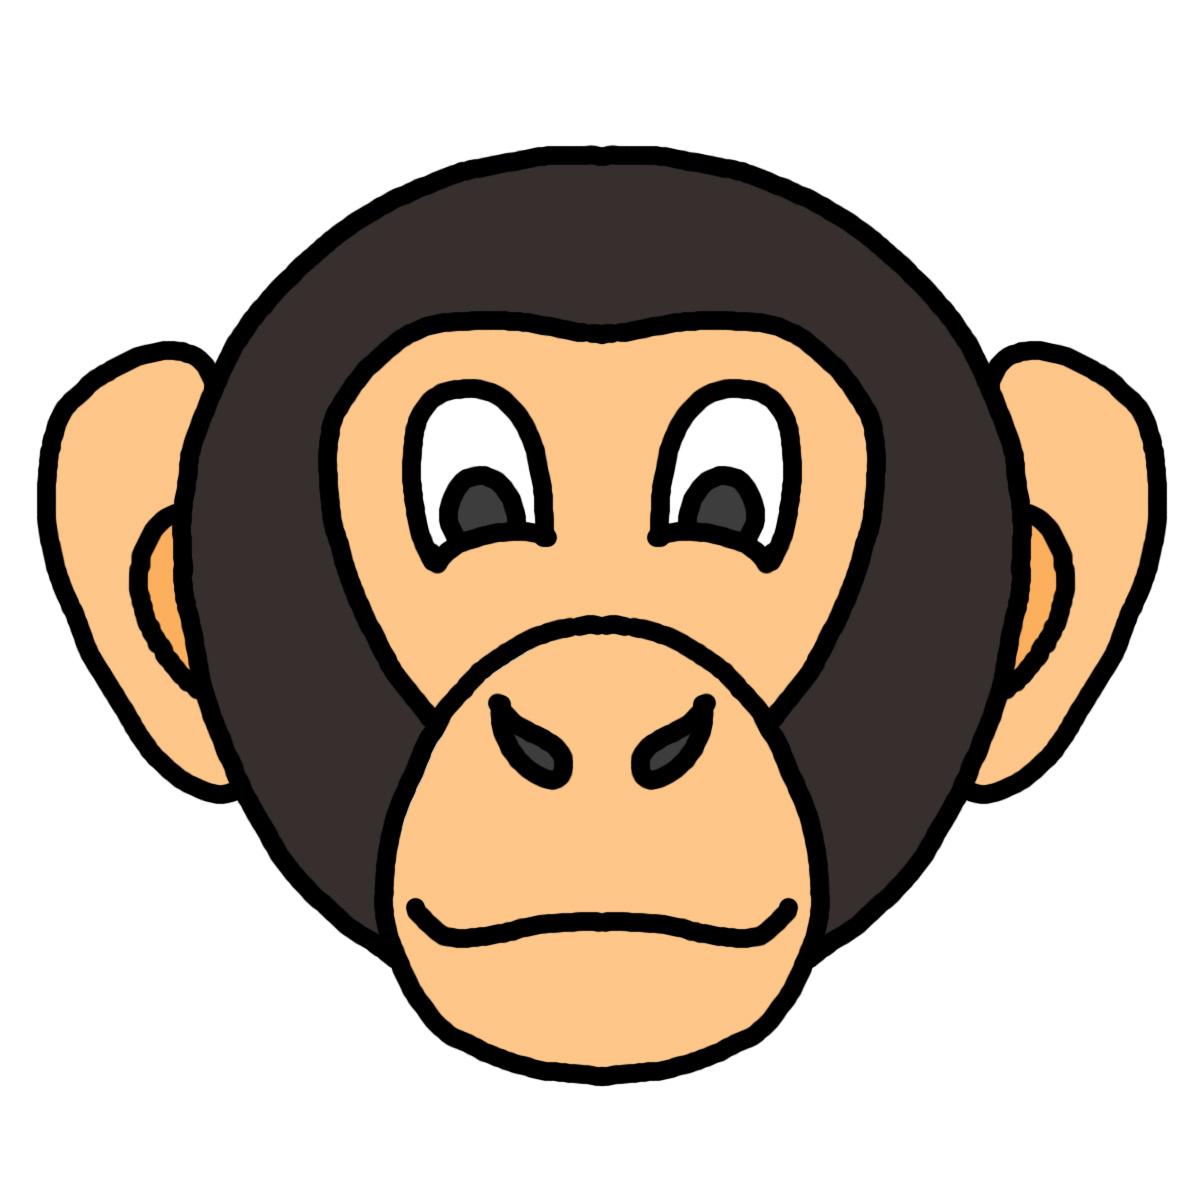 clipart monkey face - photo #44